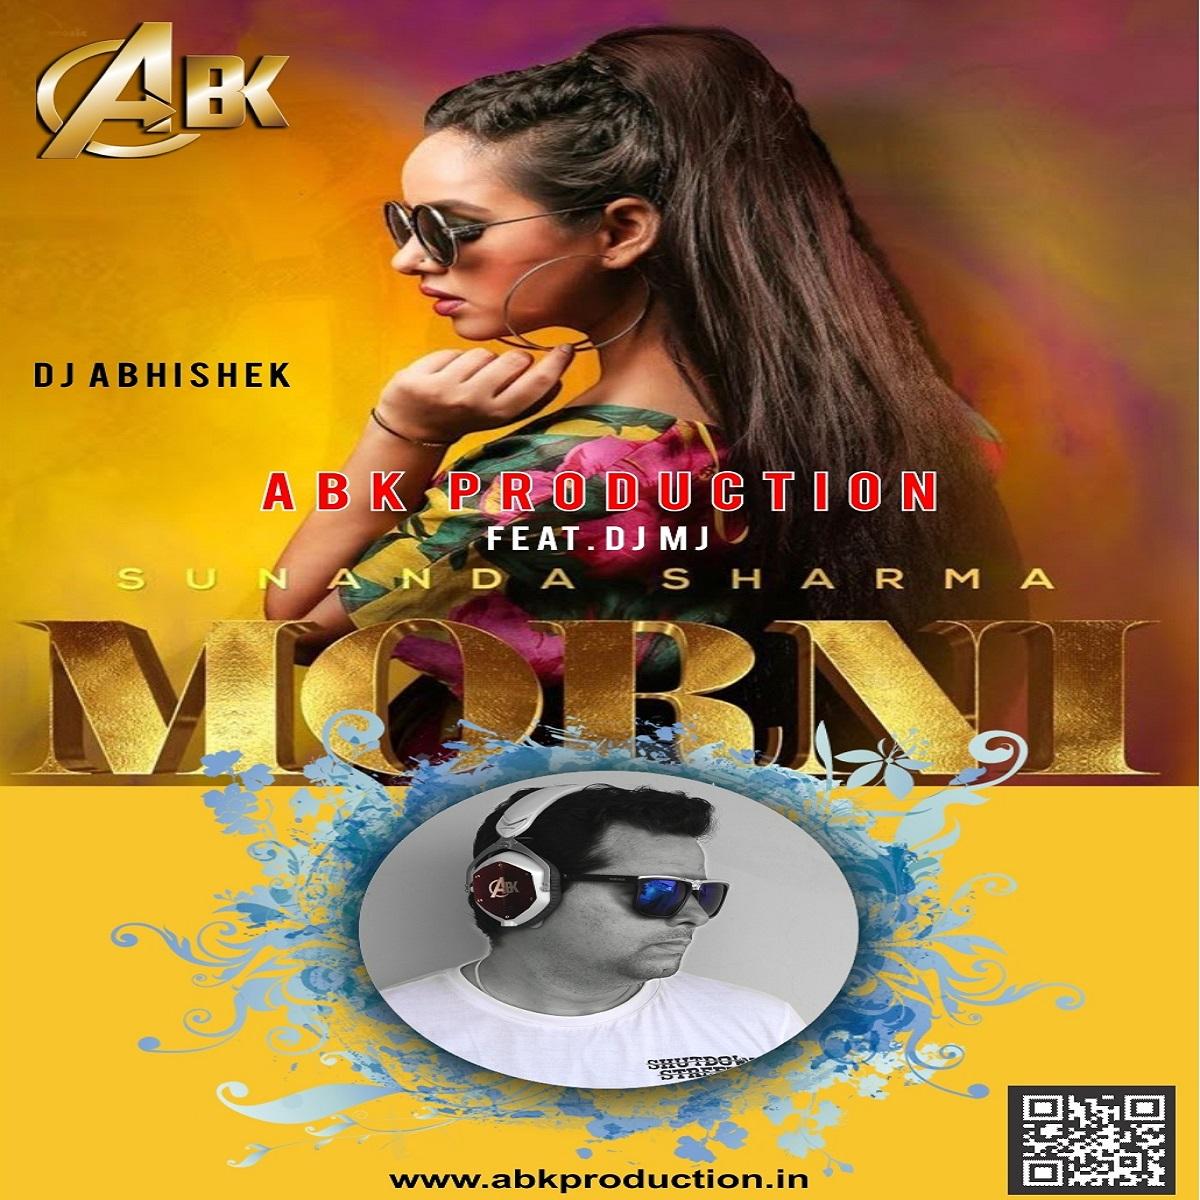 Bhagwa Rang Dj: Sunanda Sharma (Remix) ABK Production